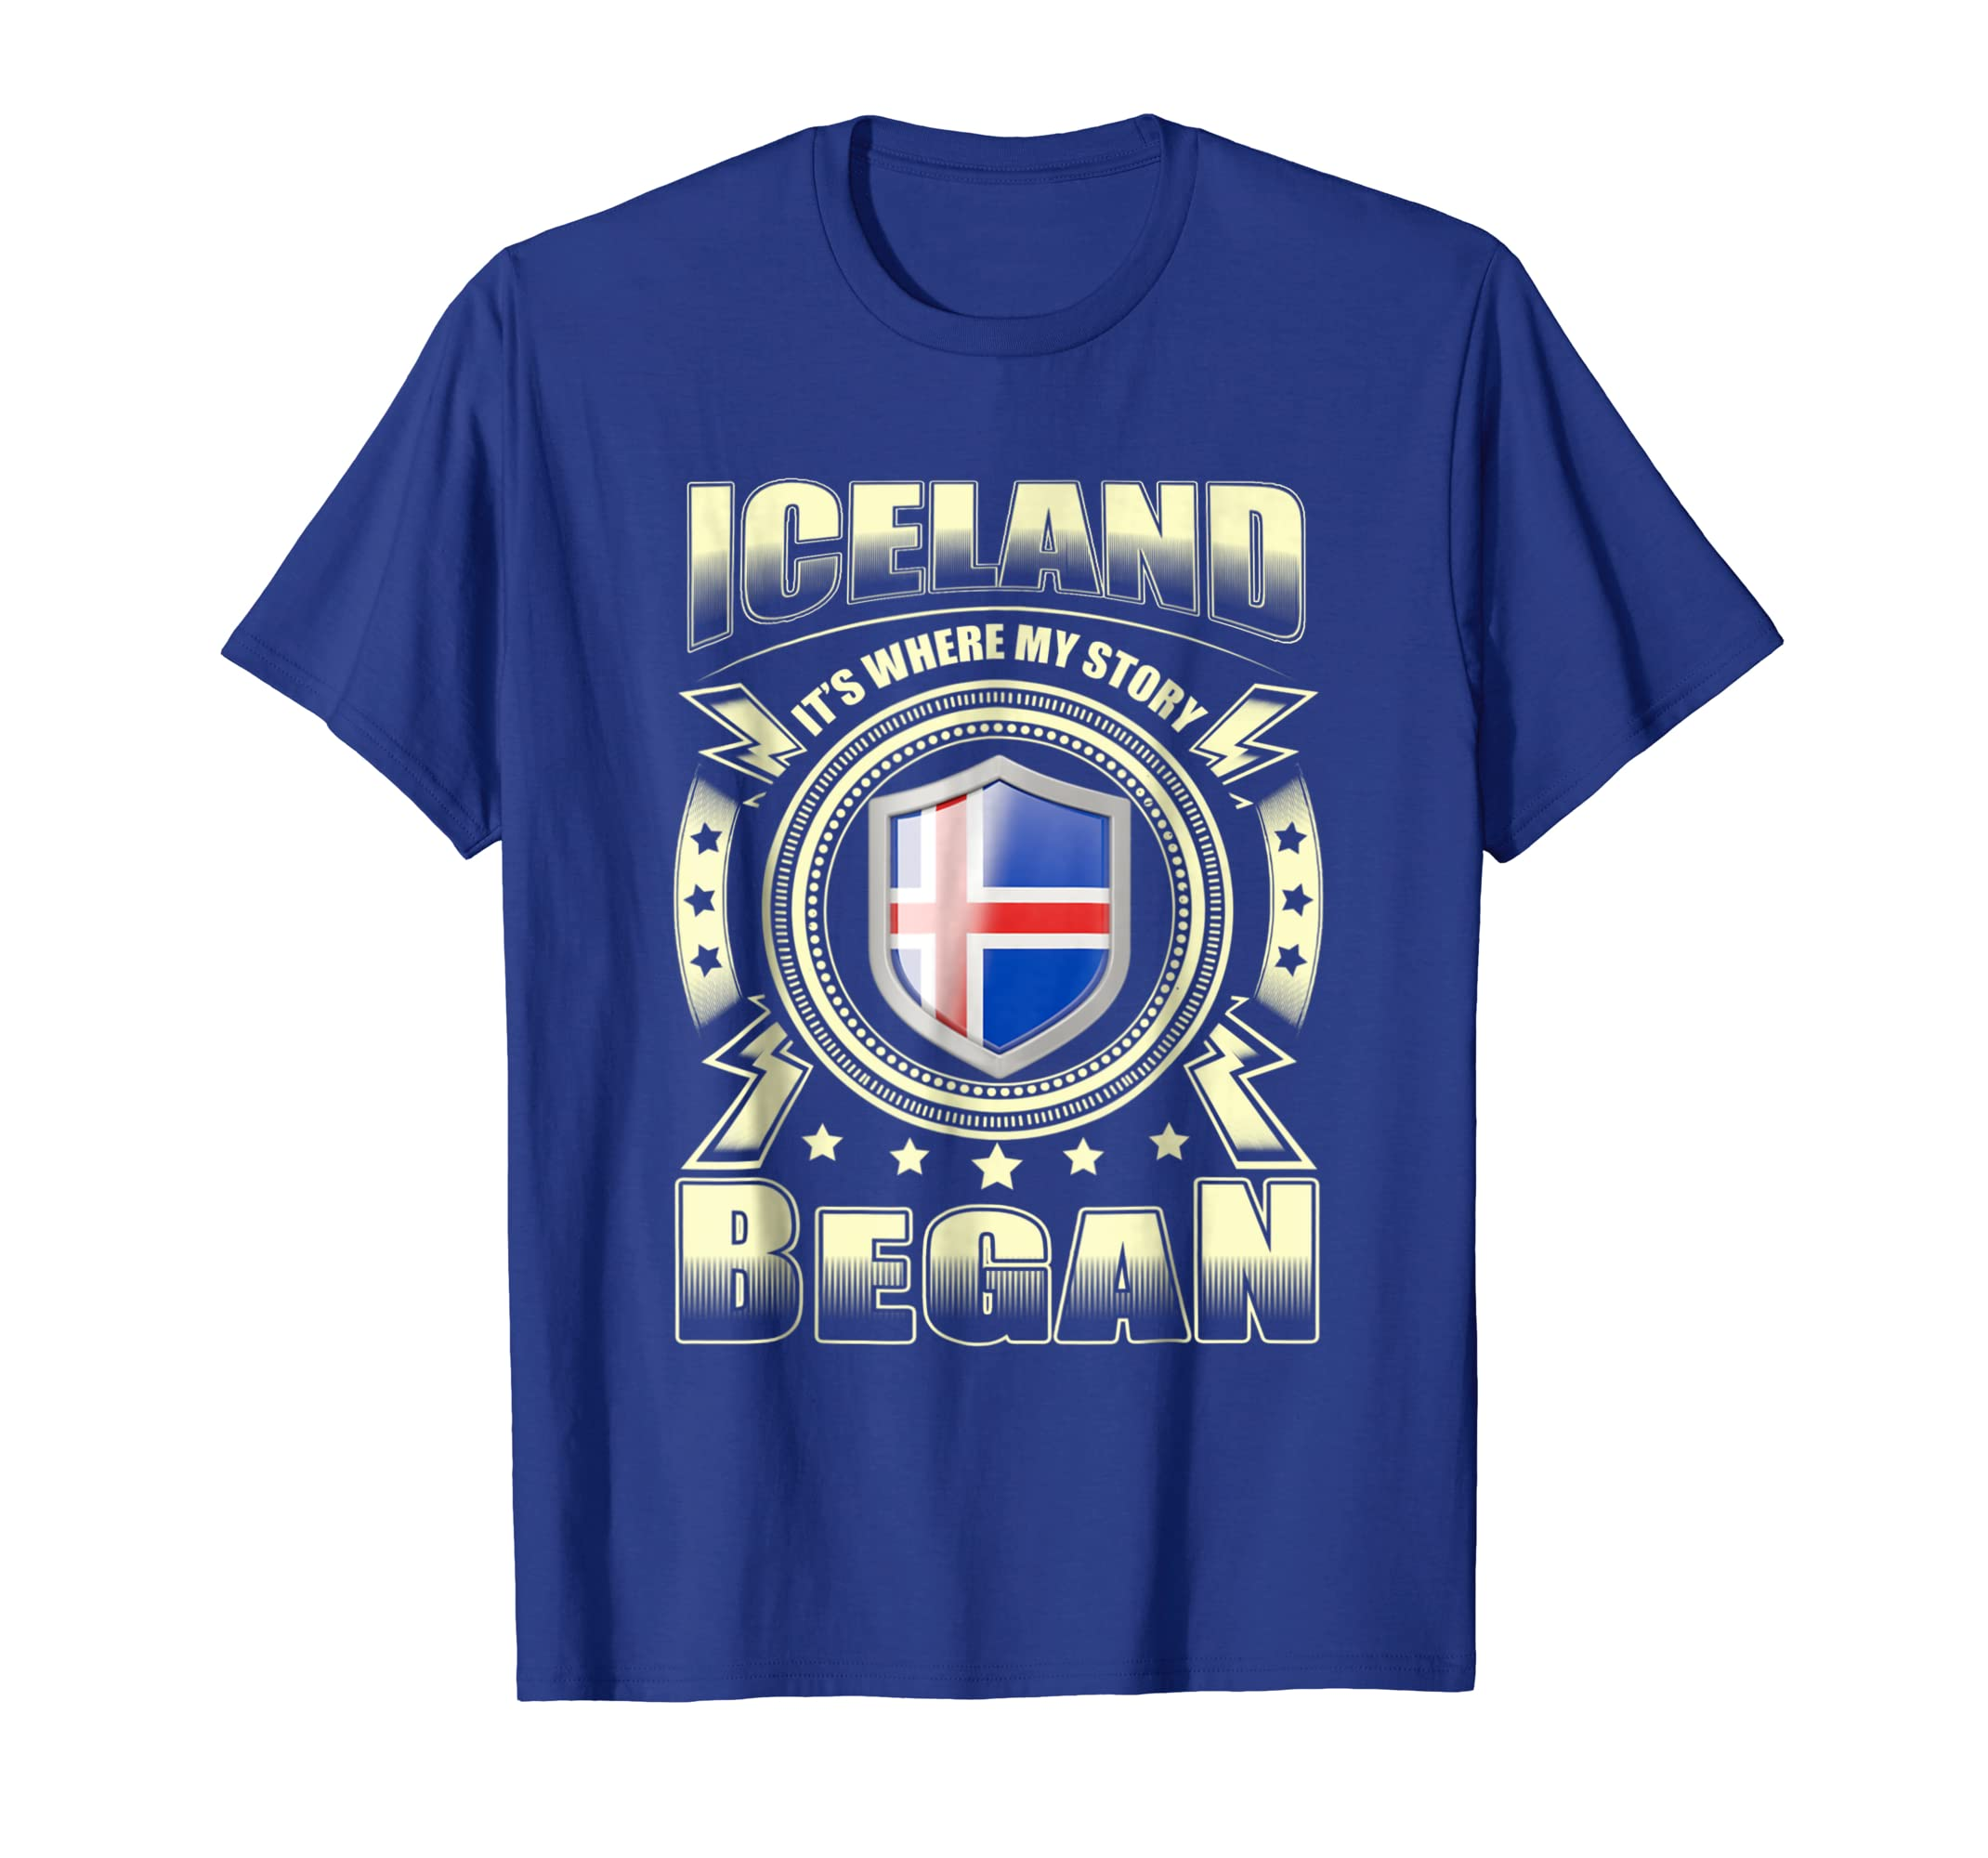 My story began in Iceland white black men women T-Shirt-ANZ